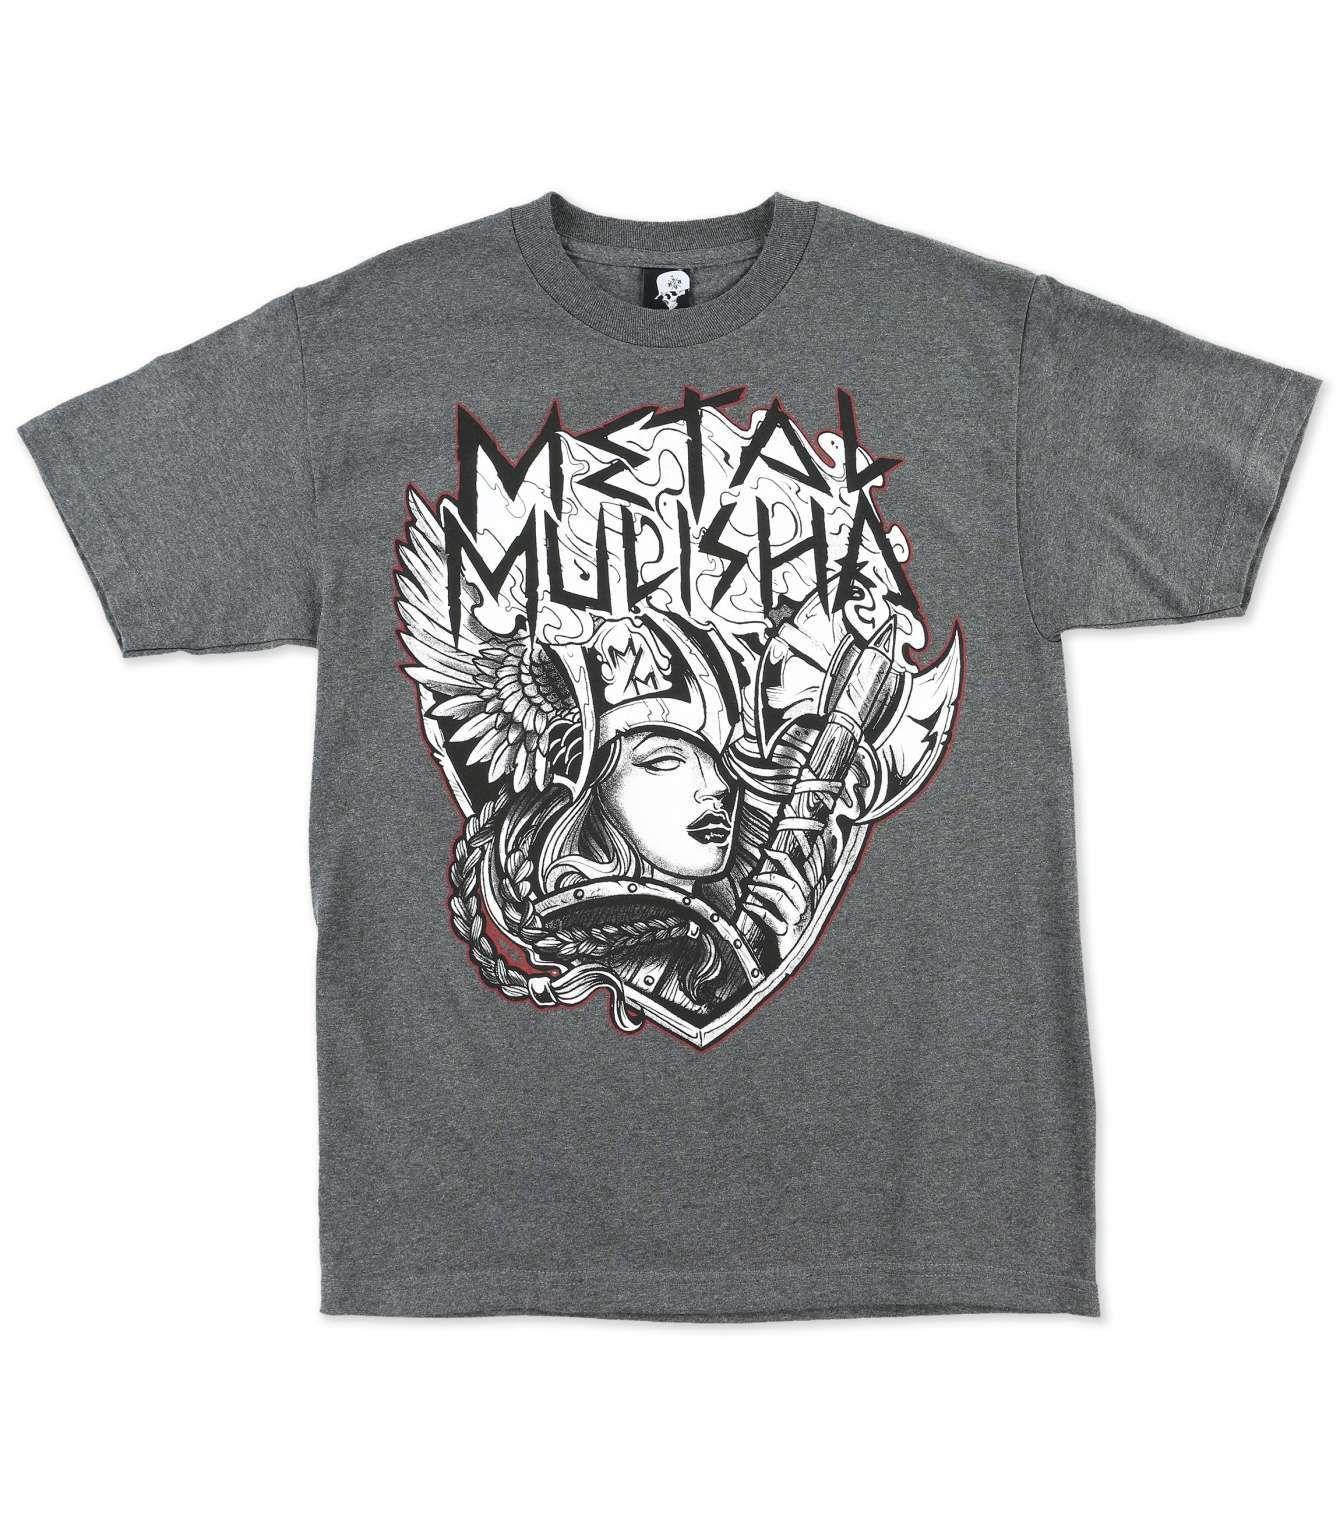 Boy/'s Youth Metal Mulisha Realtree Cotton T-Shirt